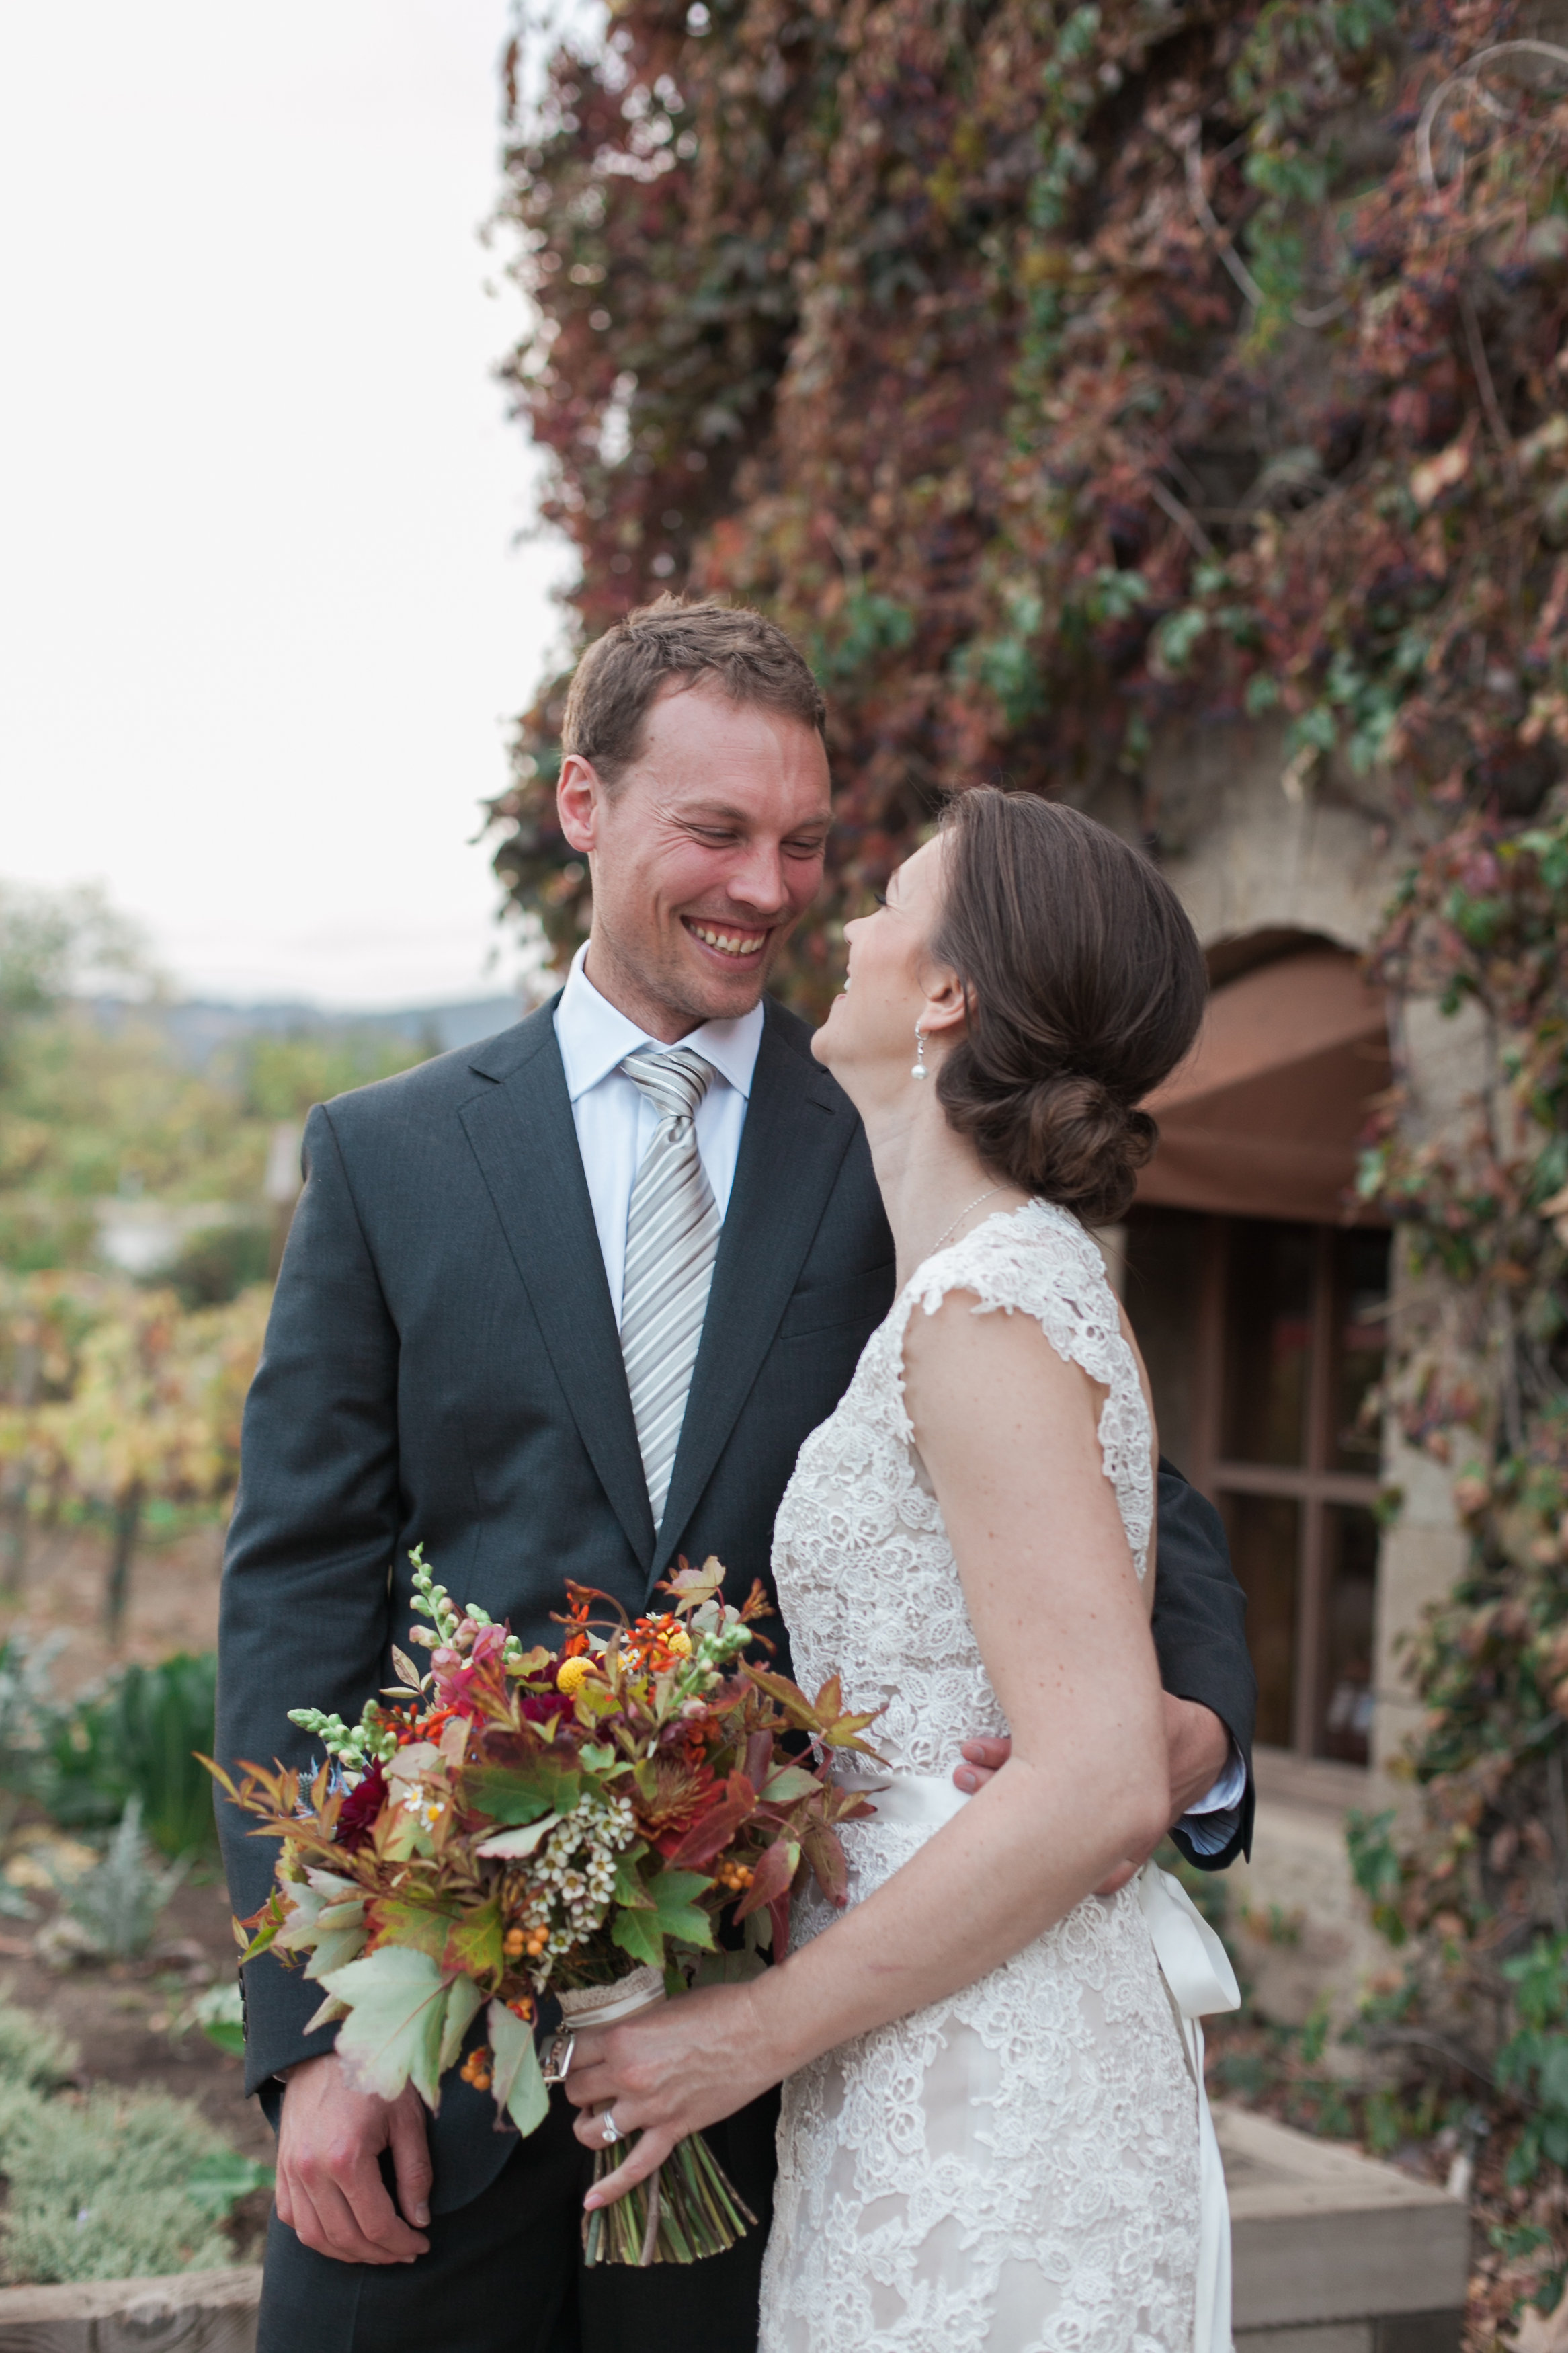 GetmarriedinYountville-weddingphotographer-60.jpg